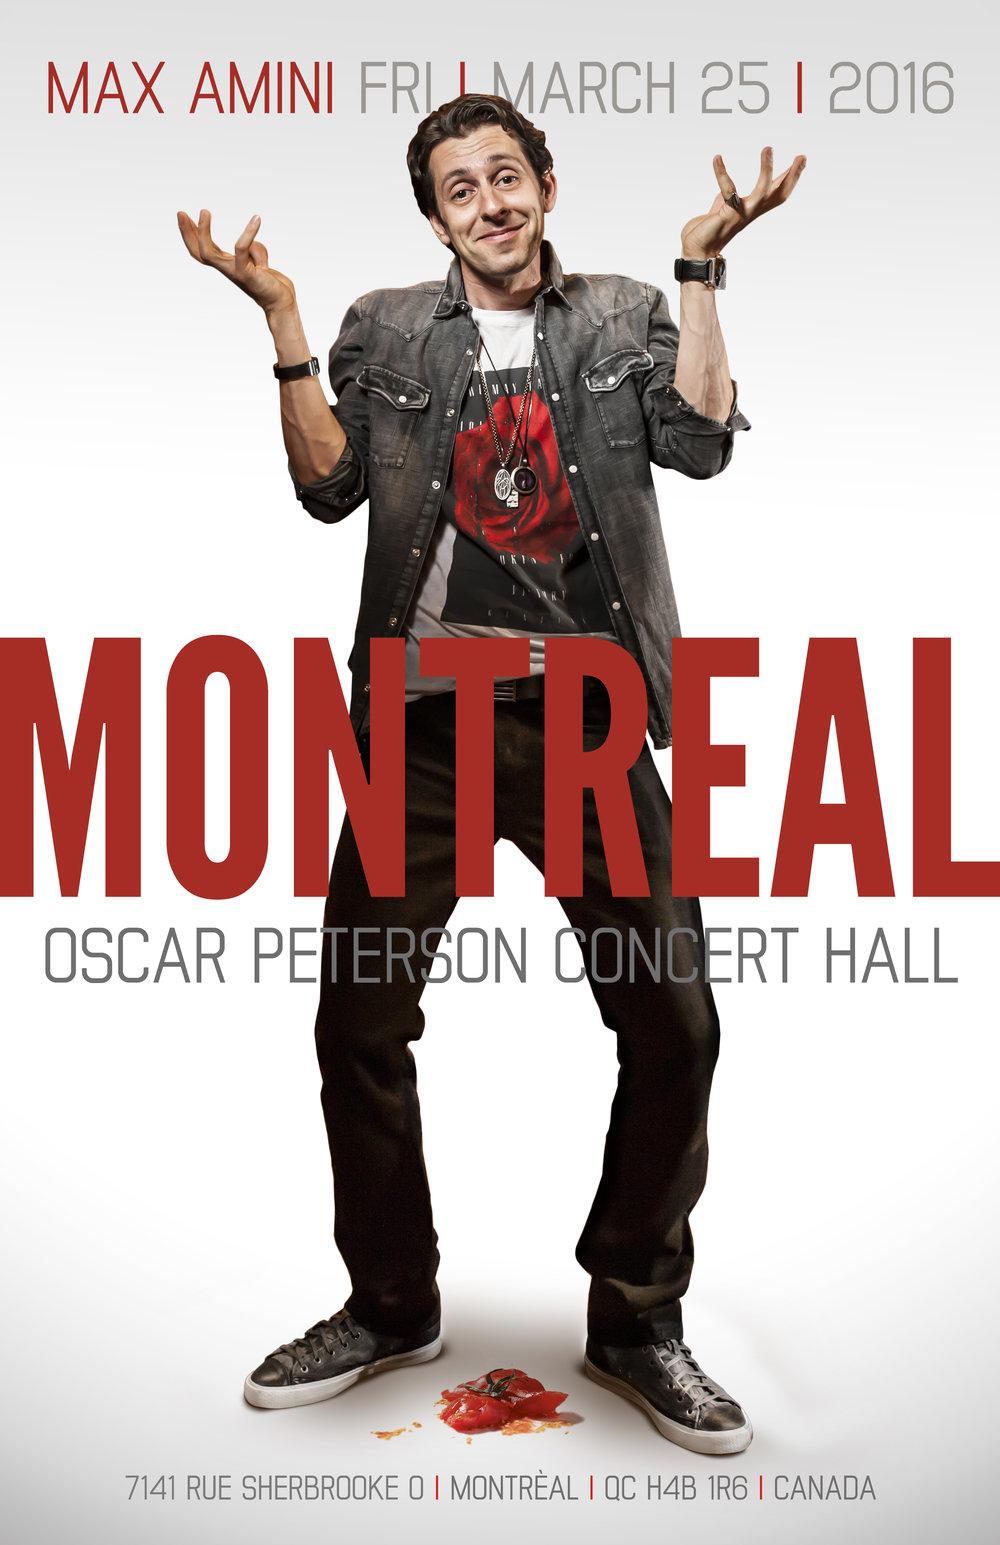 Montreal_012216_11x17_1.jpg